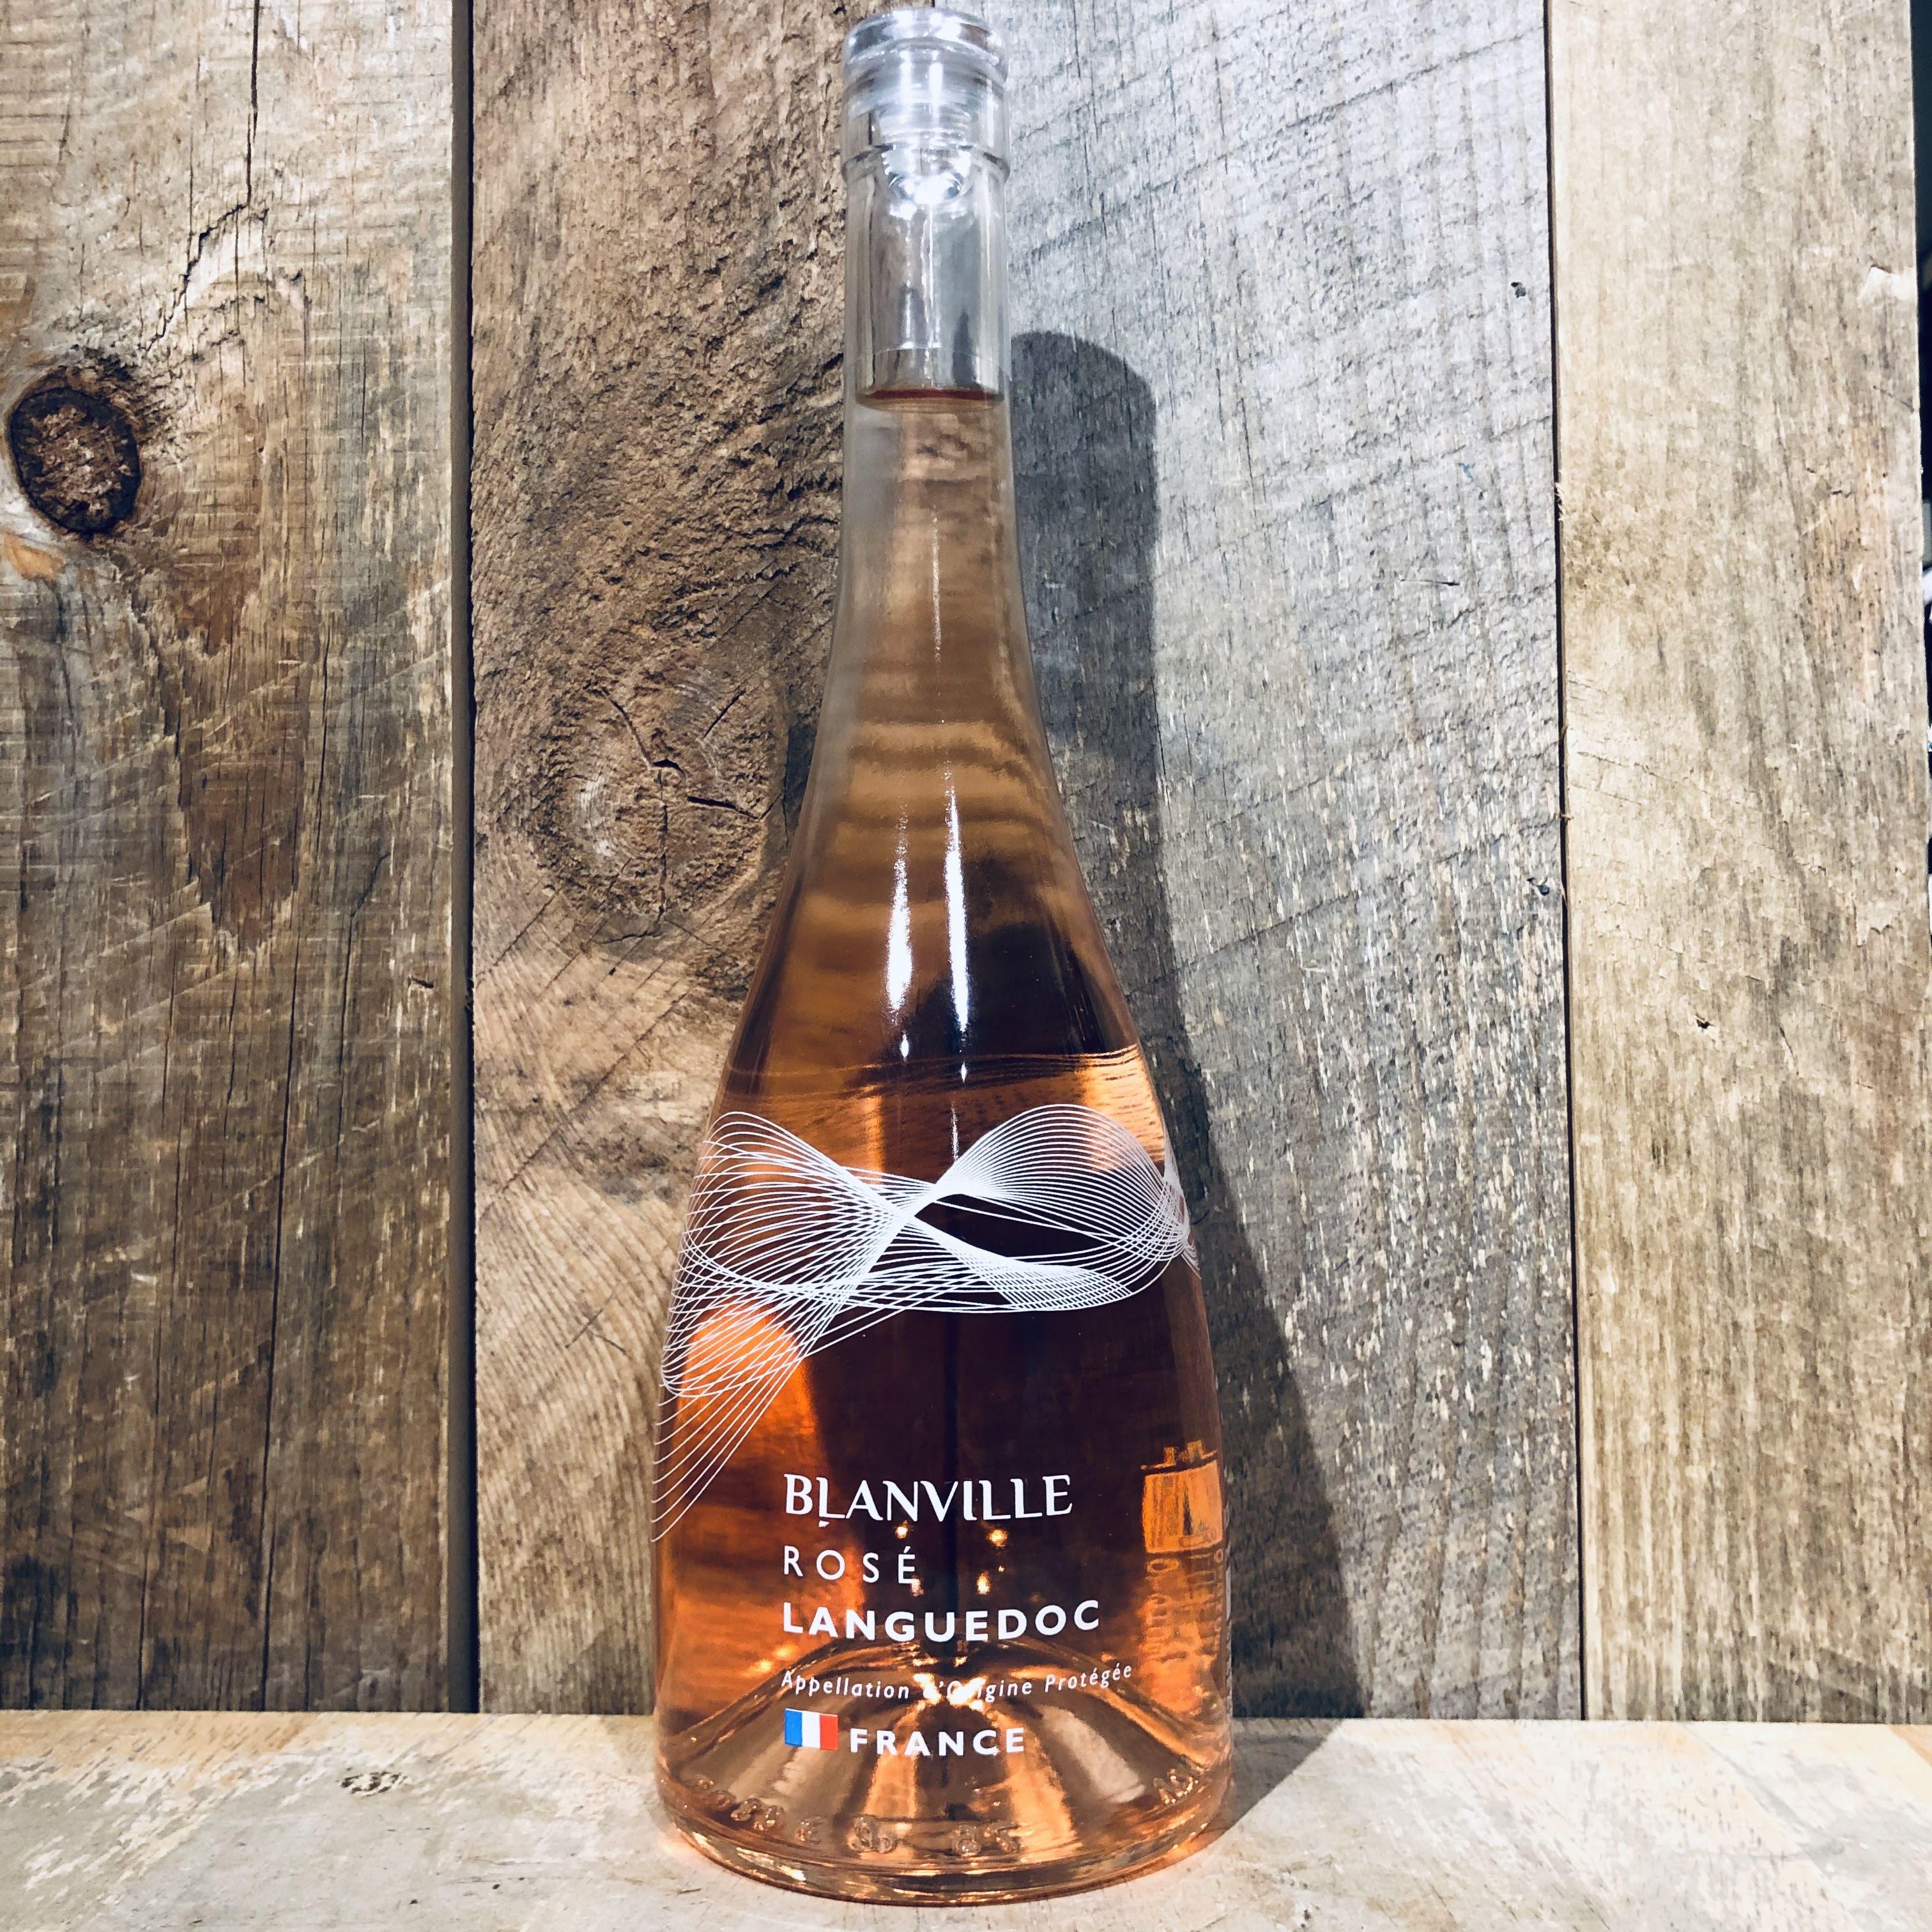 Blanville Rose 2019 750ml